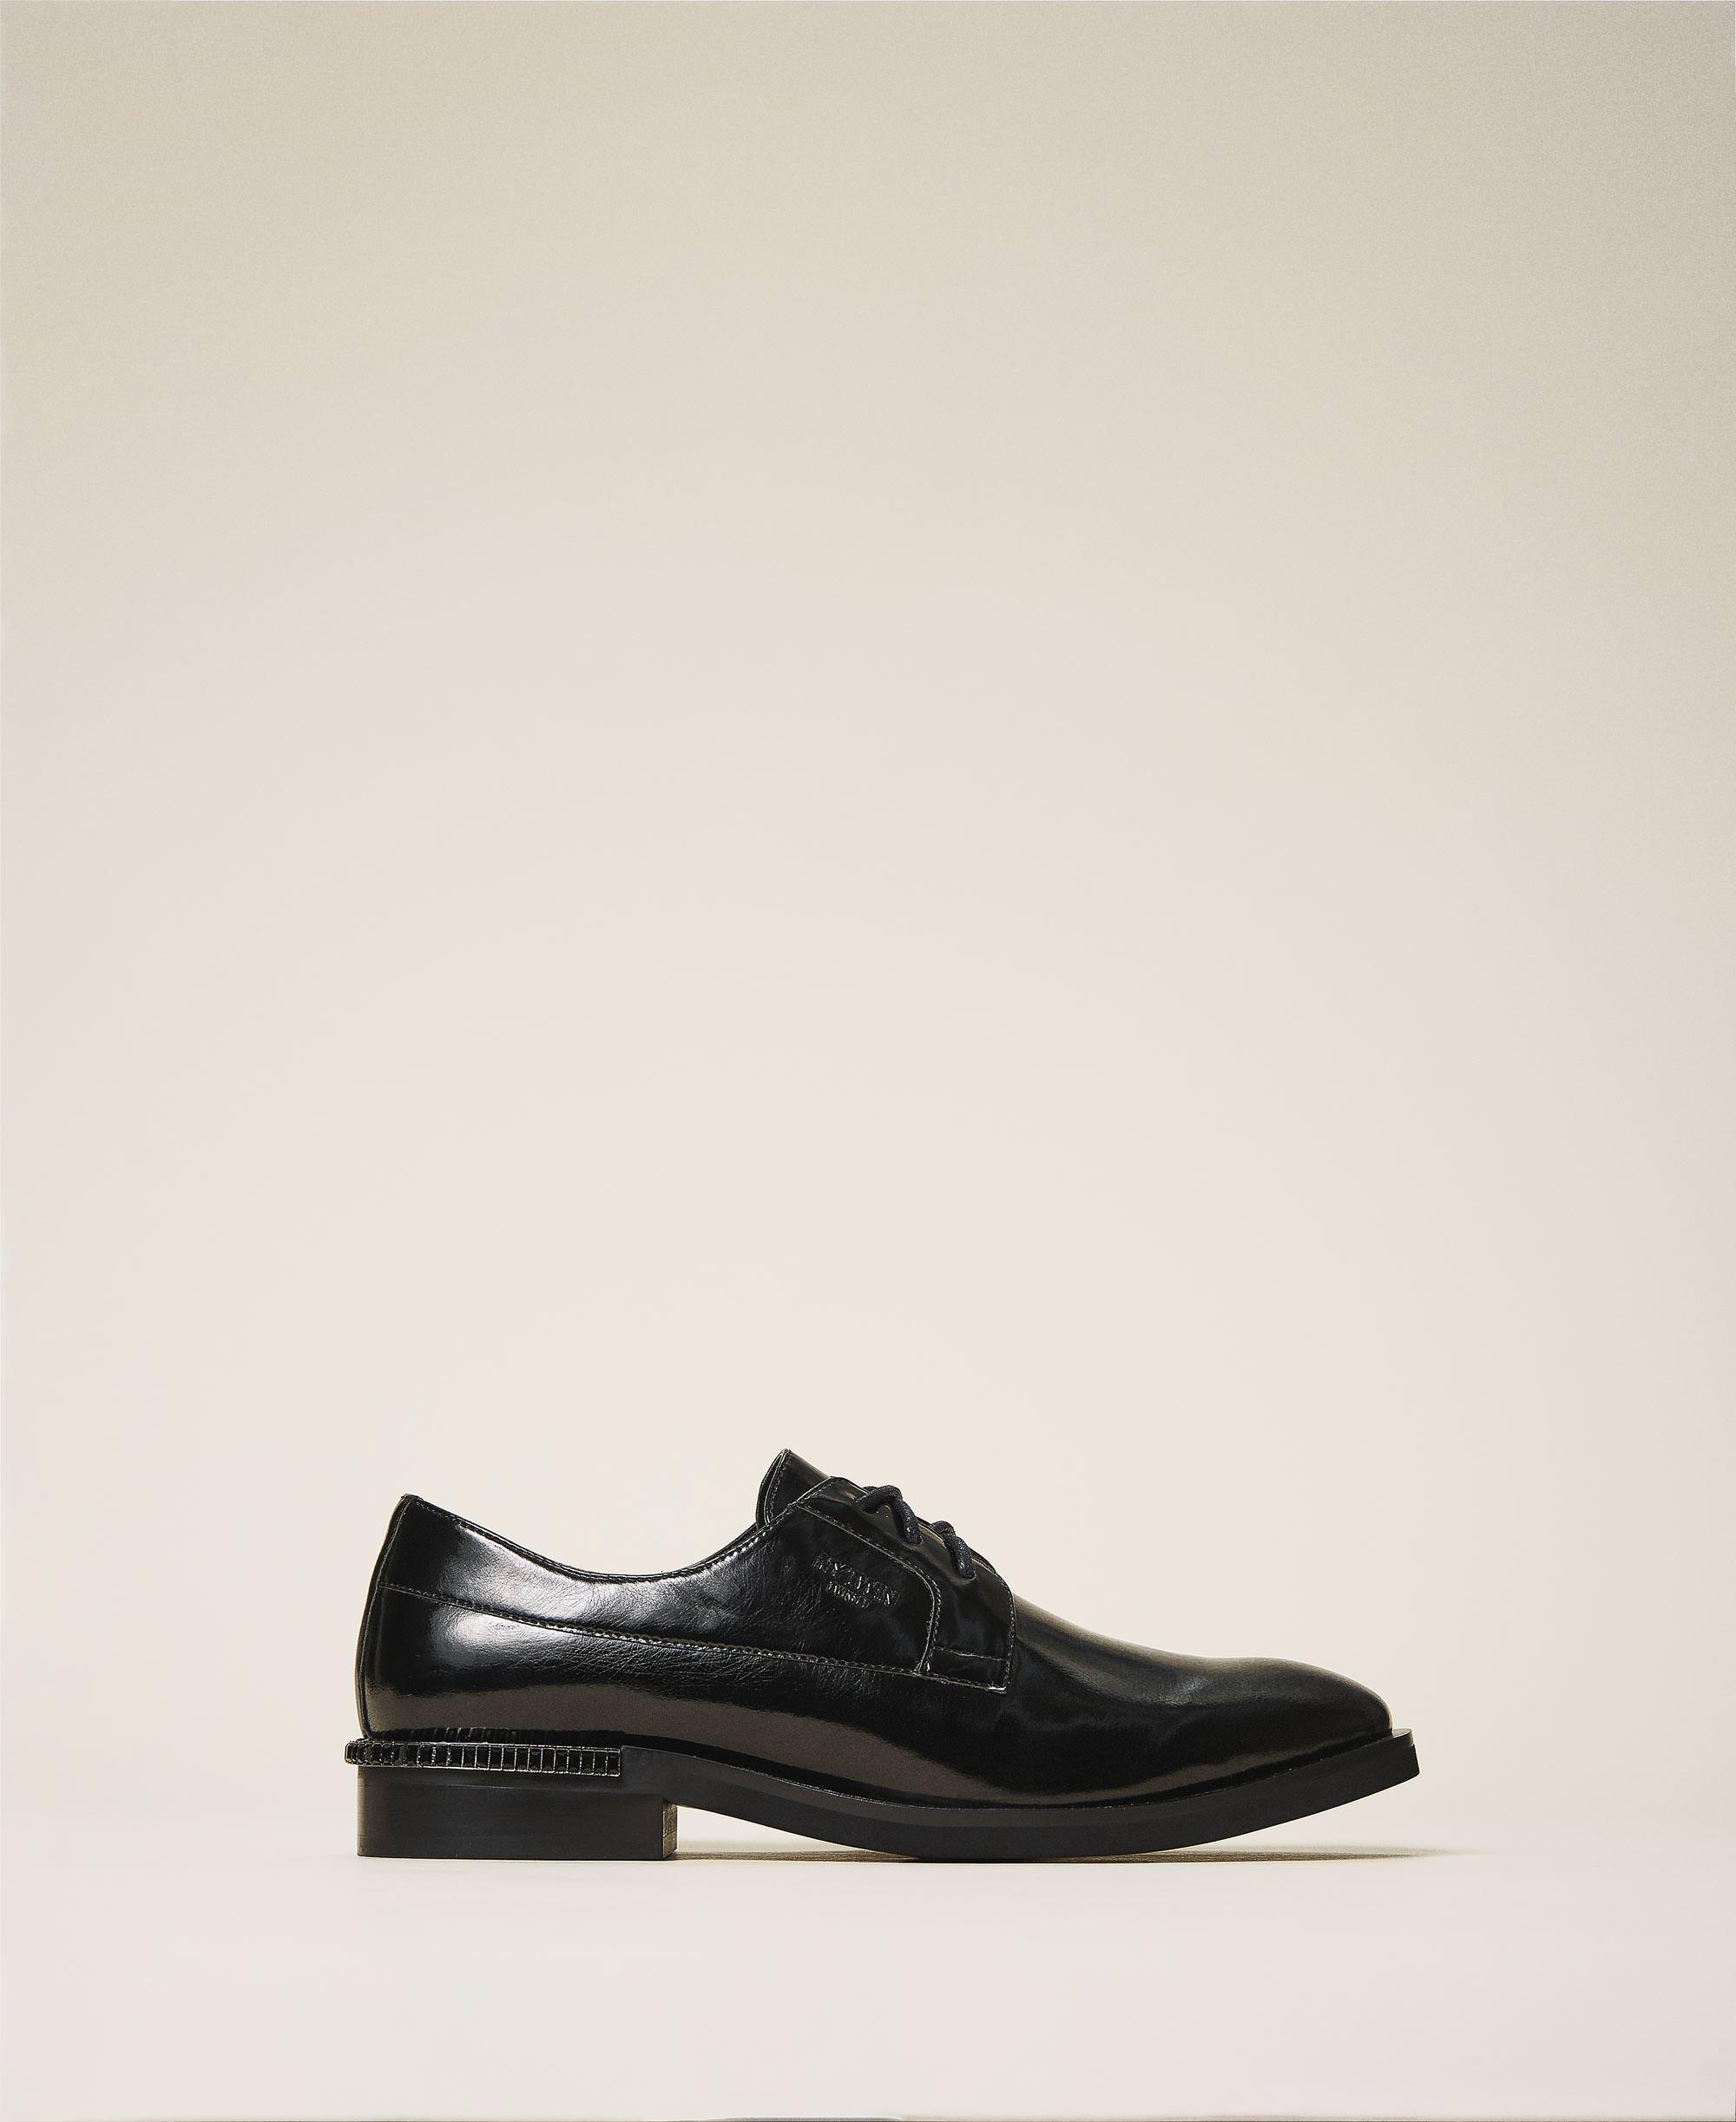 Tie-up shoes with decorative heel